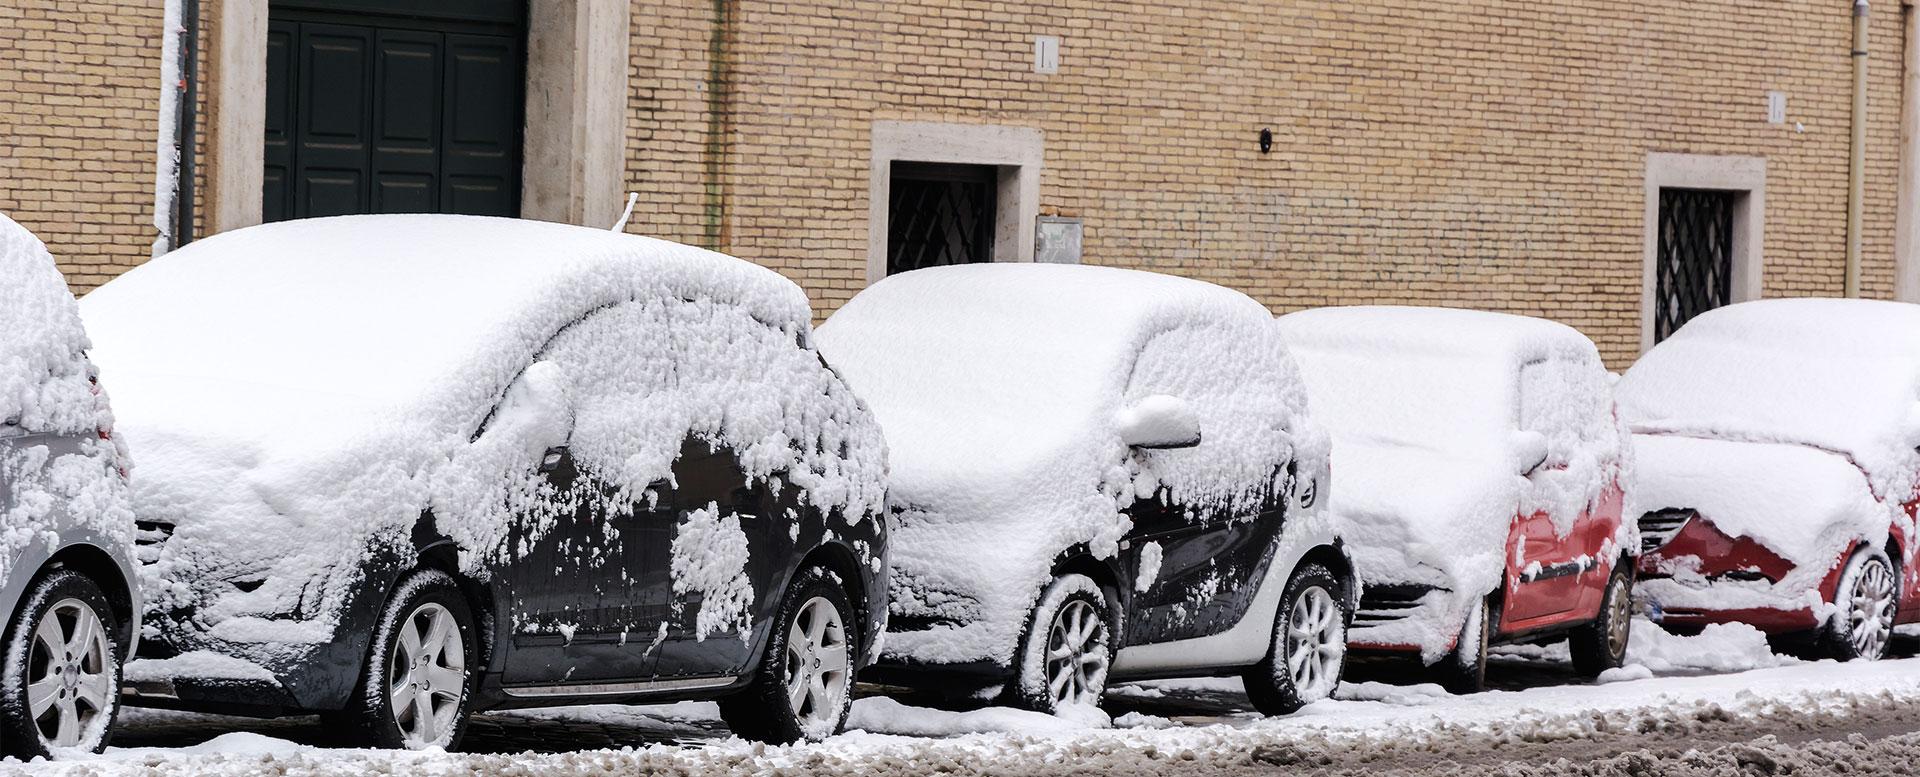 Dachlawinen können Schäden an Autos verursachen